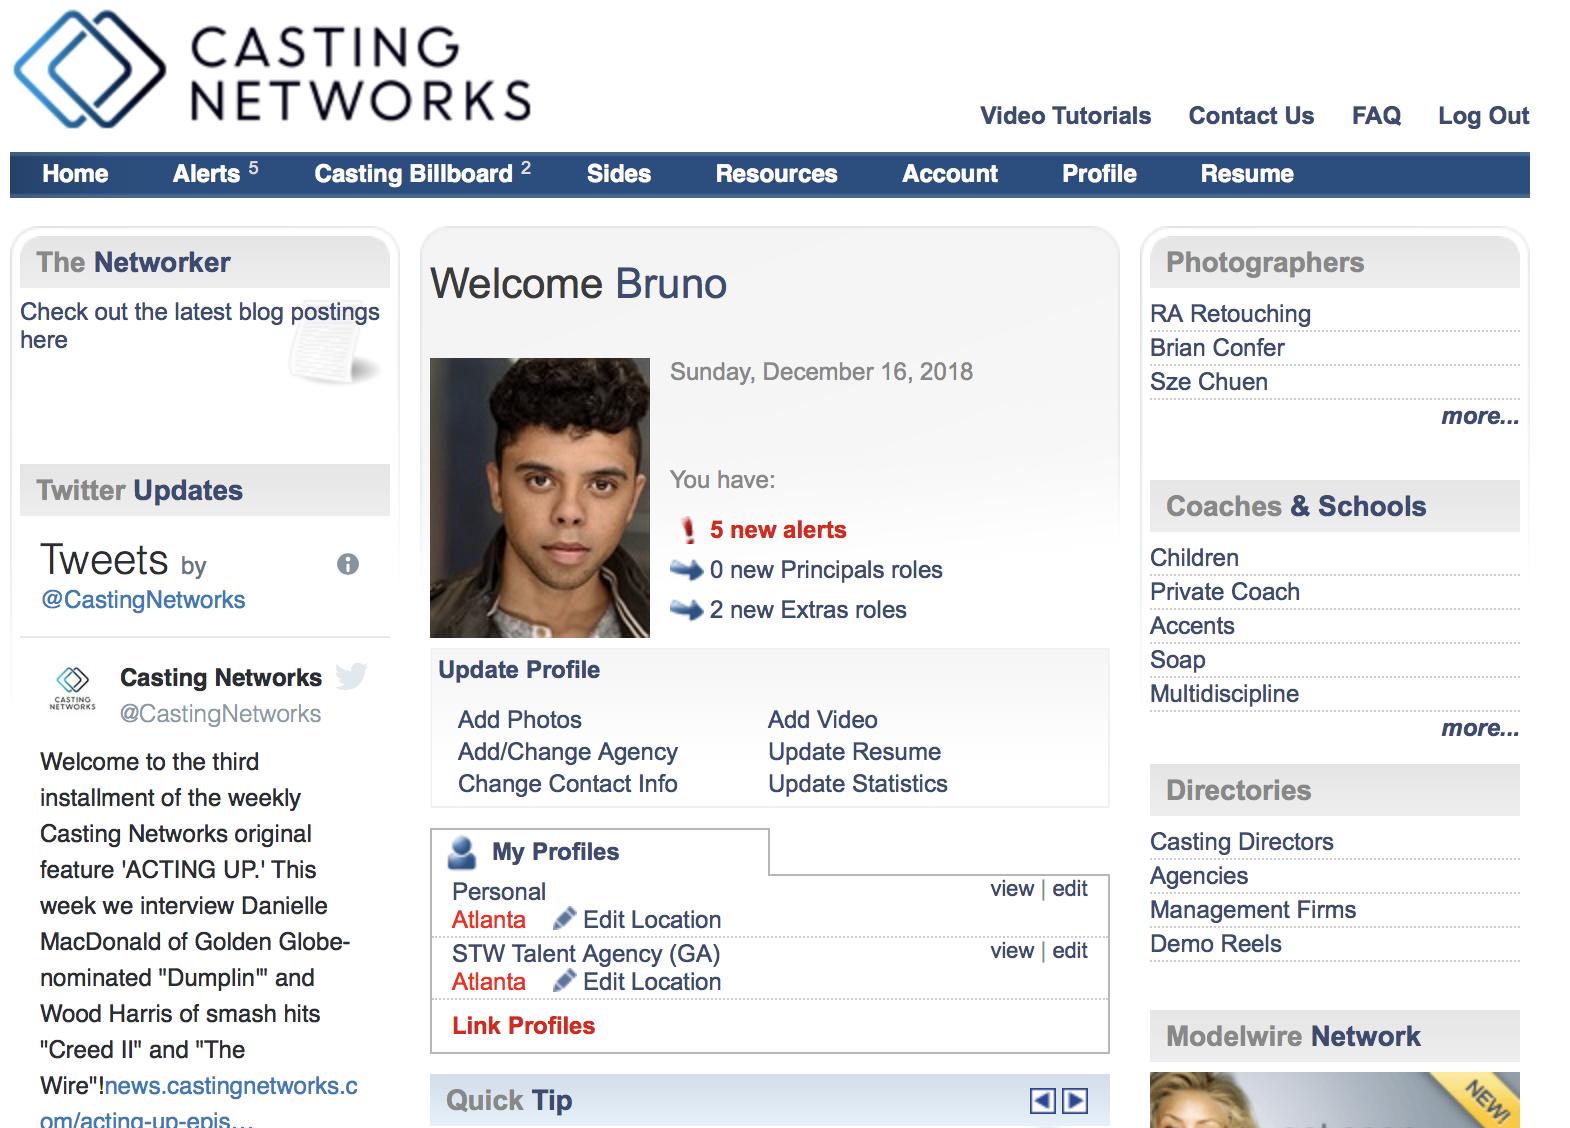 example-of-casting-networks-actor-profile-bruno-rose-atlanta